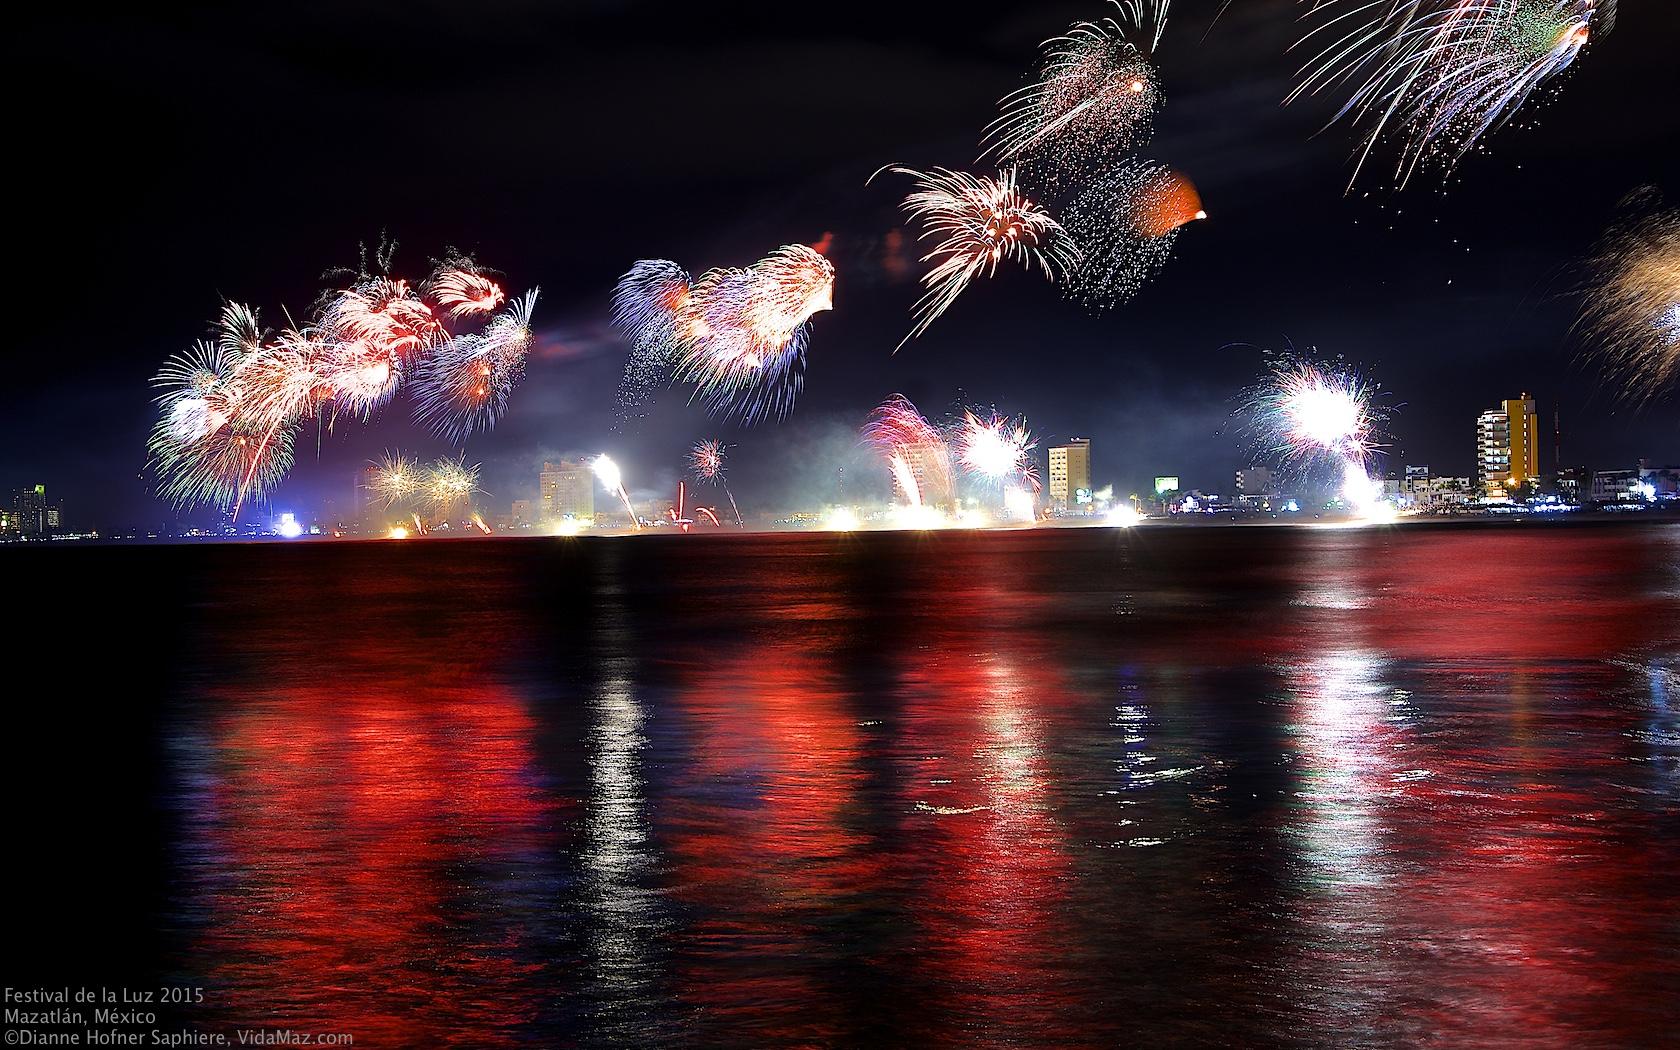 Image result for Festival de la Luz mazatlan